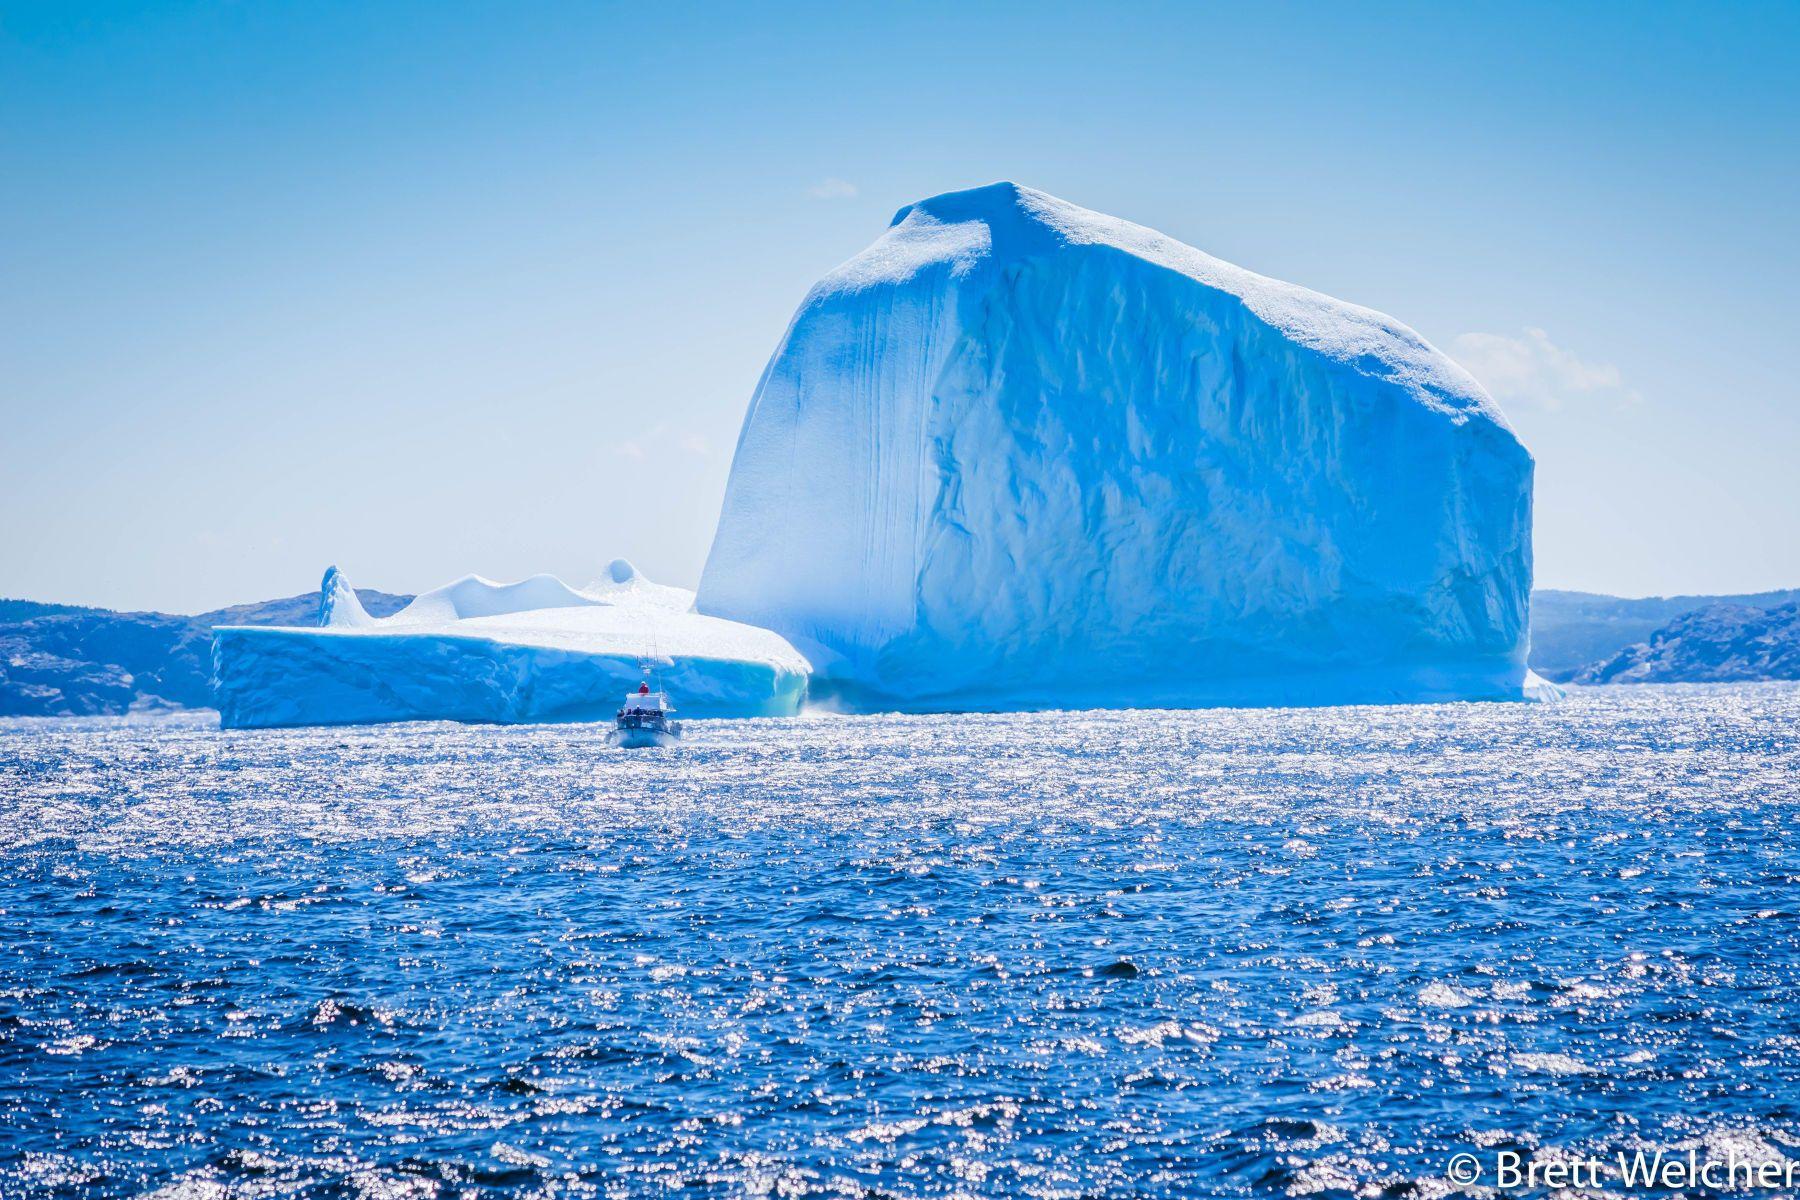 Icebergs - Twillingate, Newfoundland and Labrador